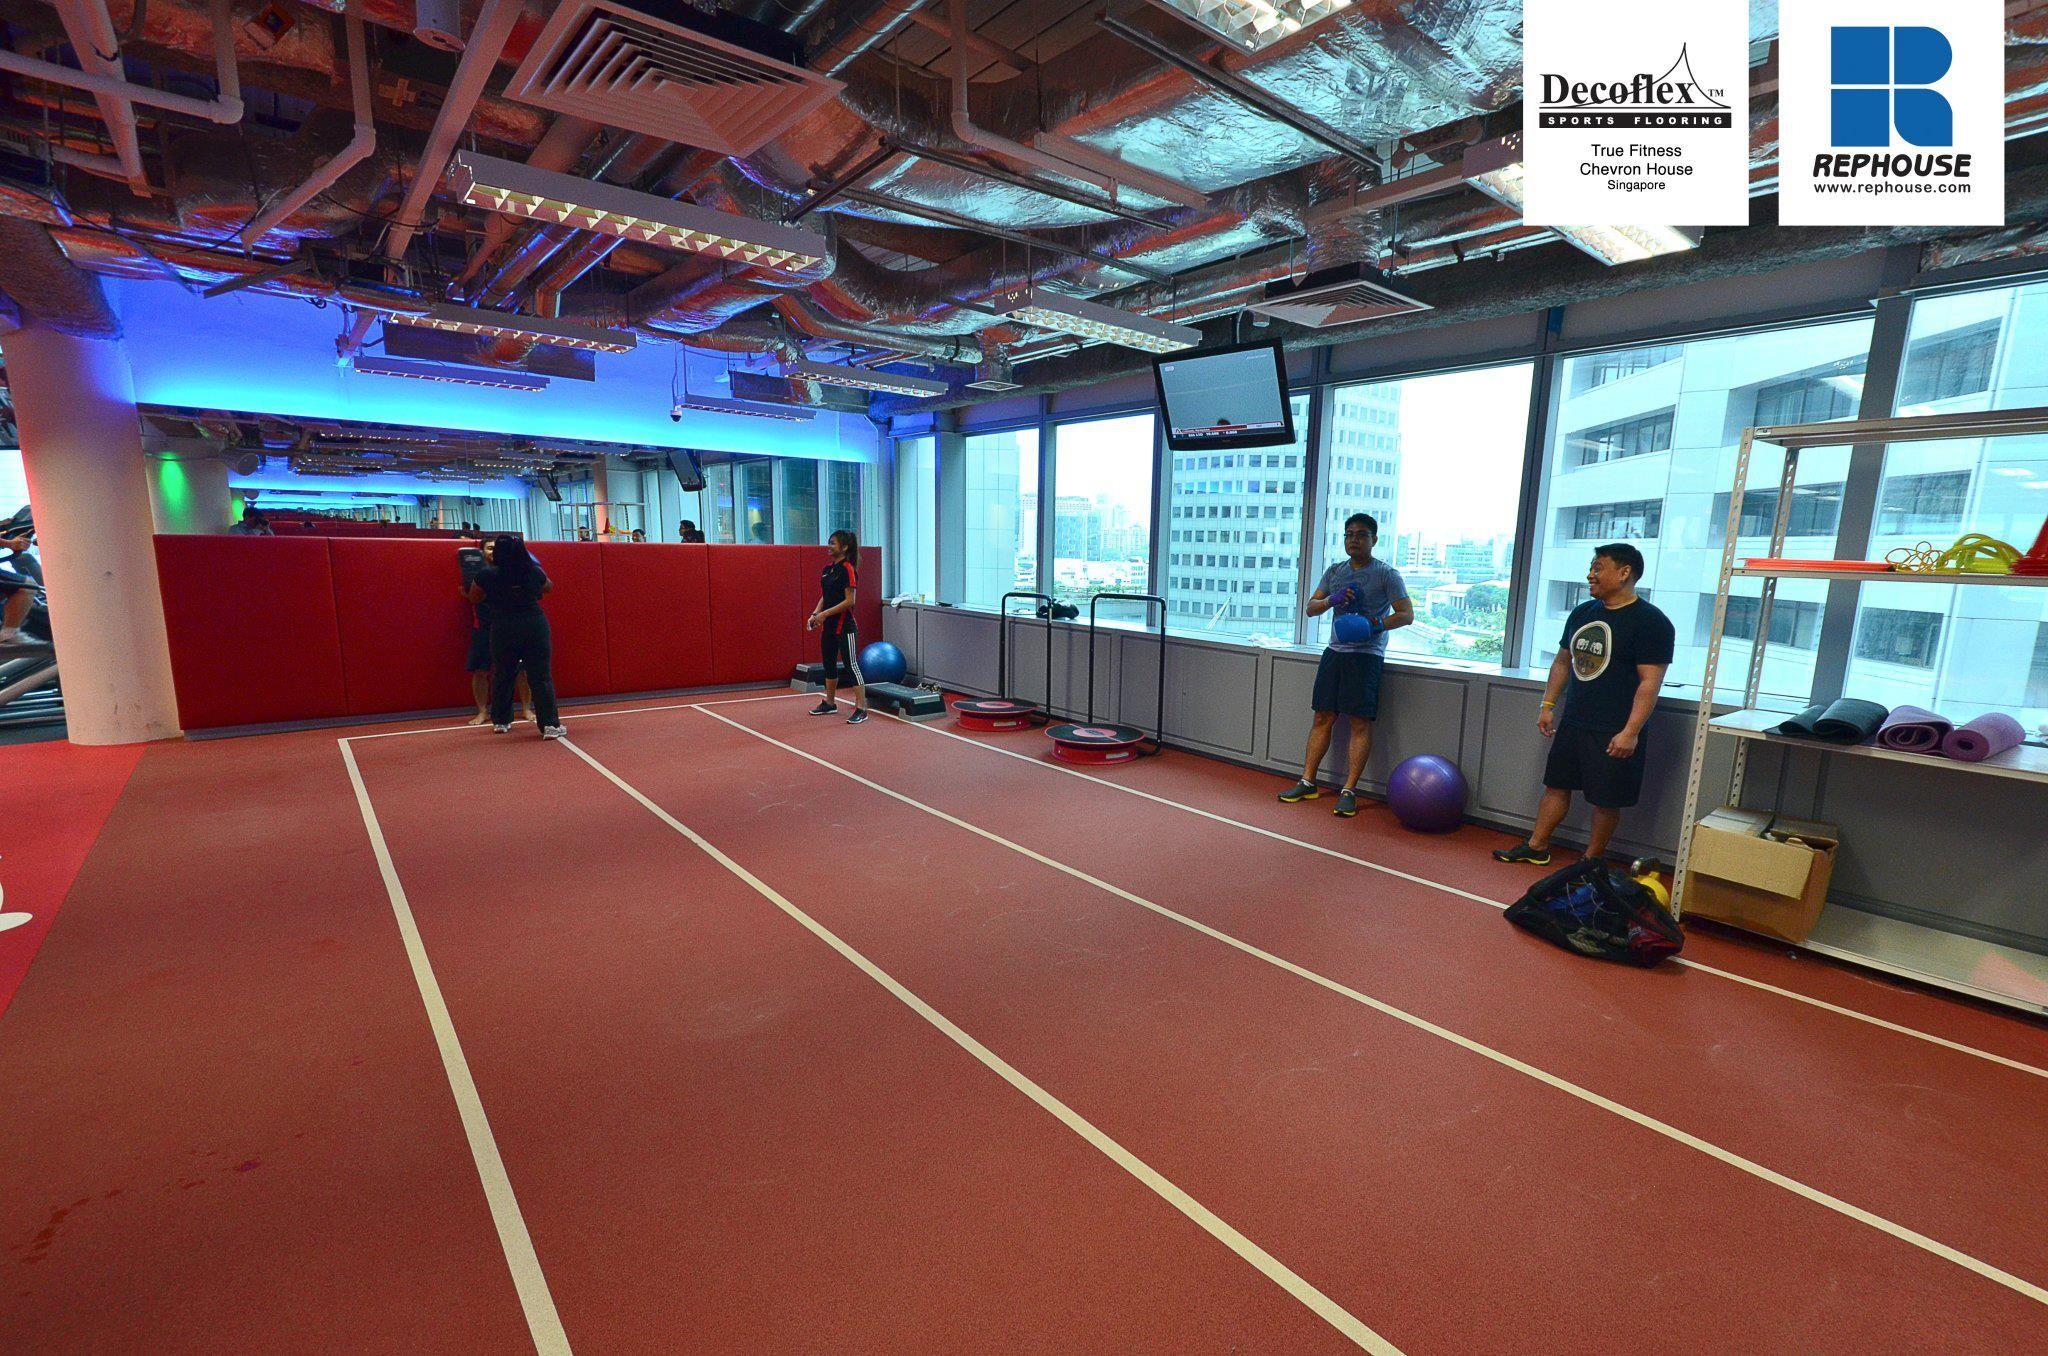 Decoflex Indoor Sprint Fitness Running Track True Fitness Chevron House Singapore Running Track Singapore Fitness